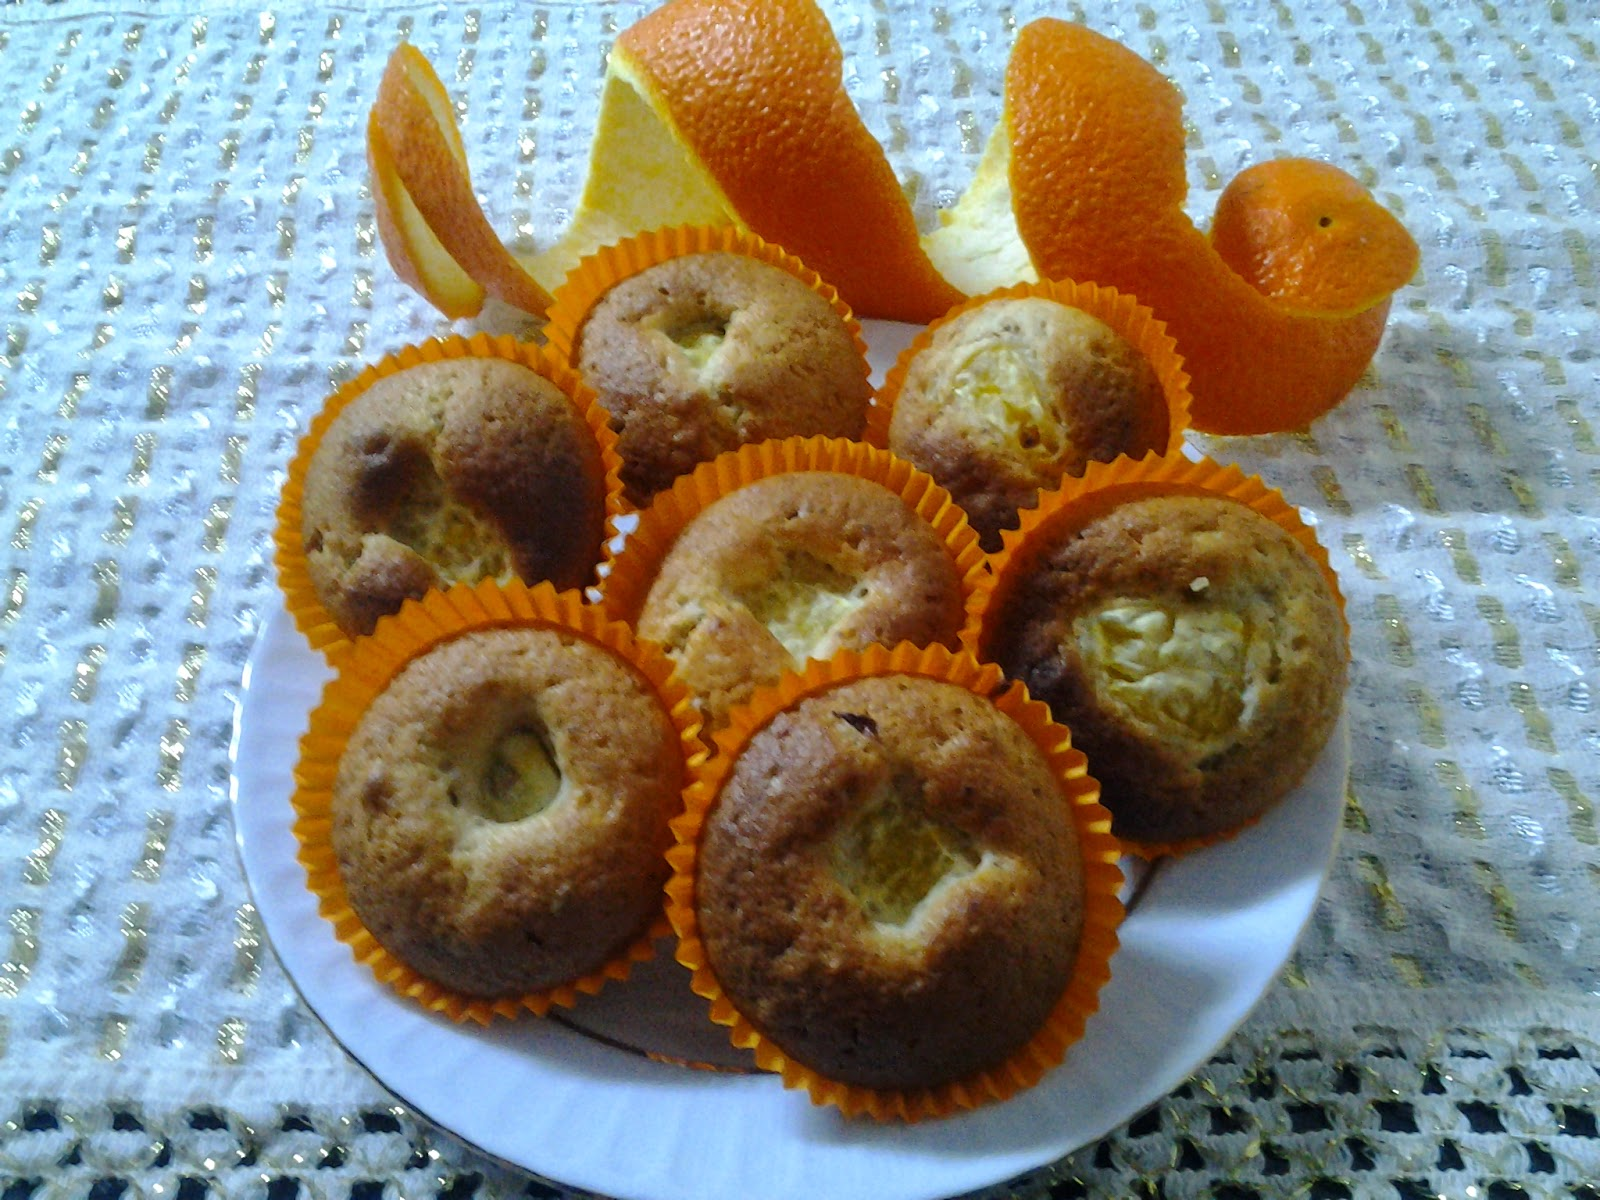 portakallı top kek tarifi